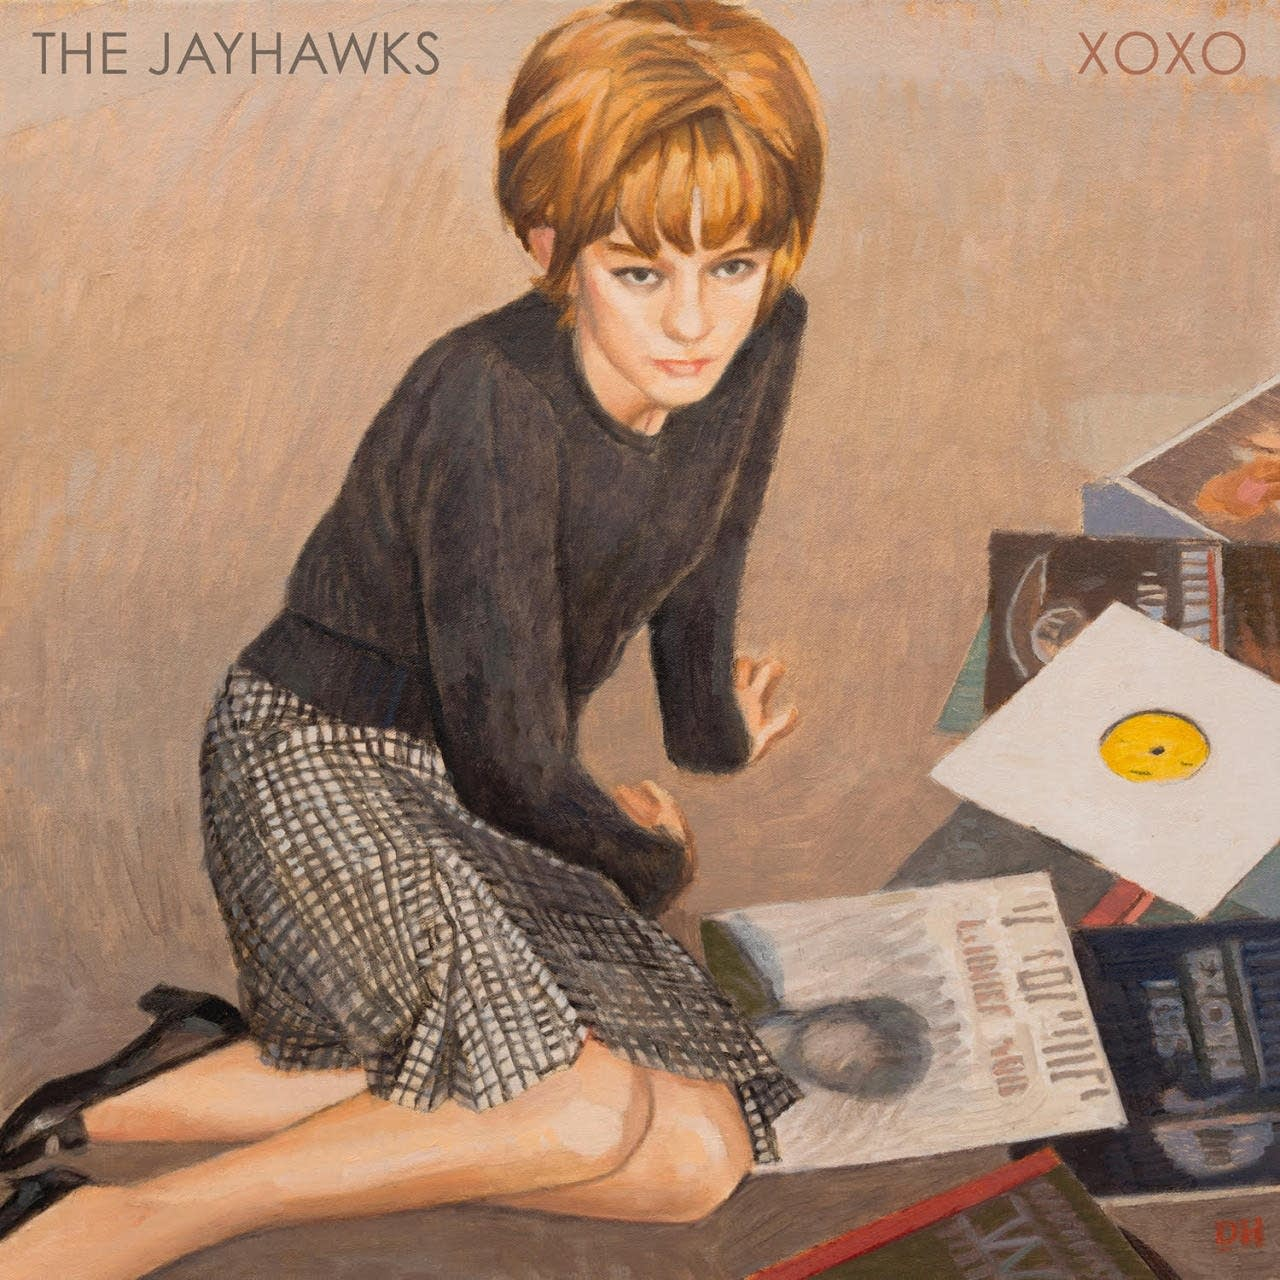 the jayhawks XOXO